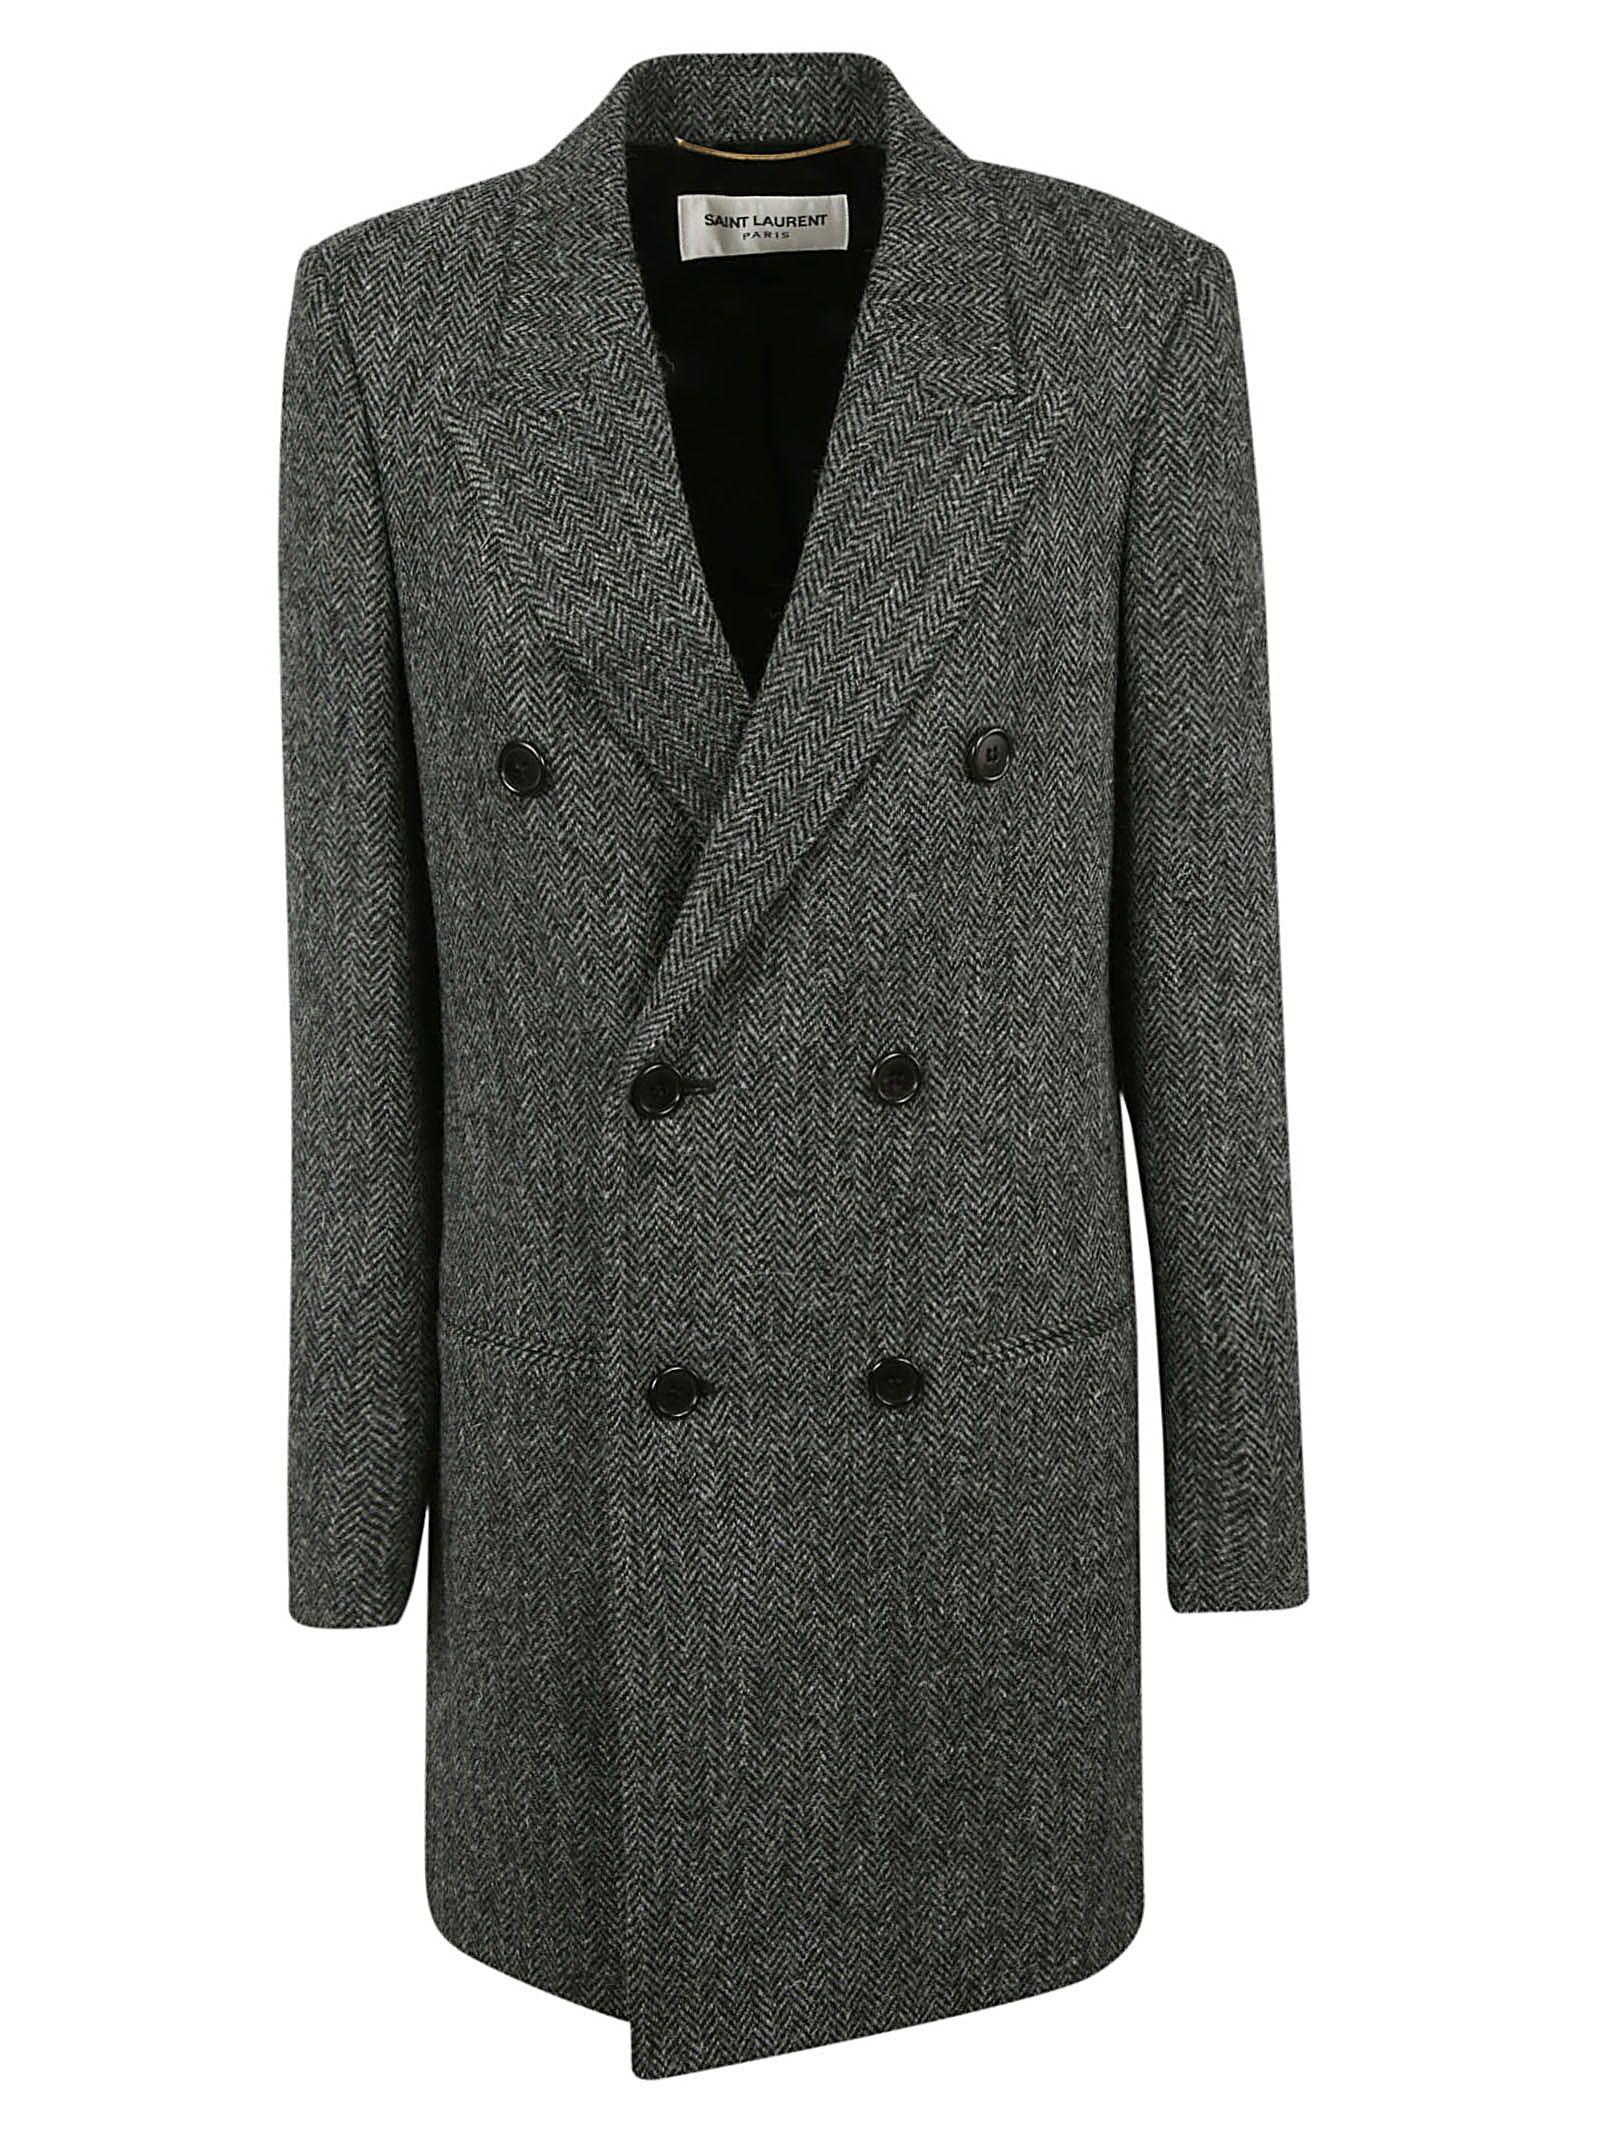 SAINT LAURENT Grey Classic Double-Breasted Coat